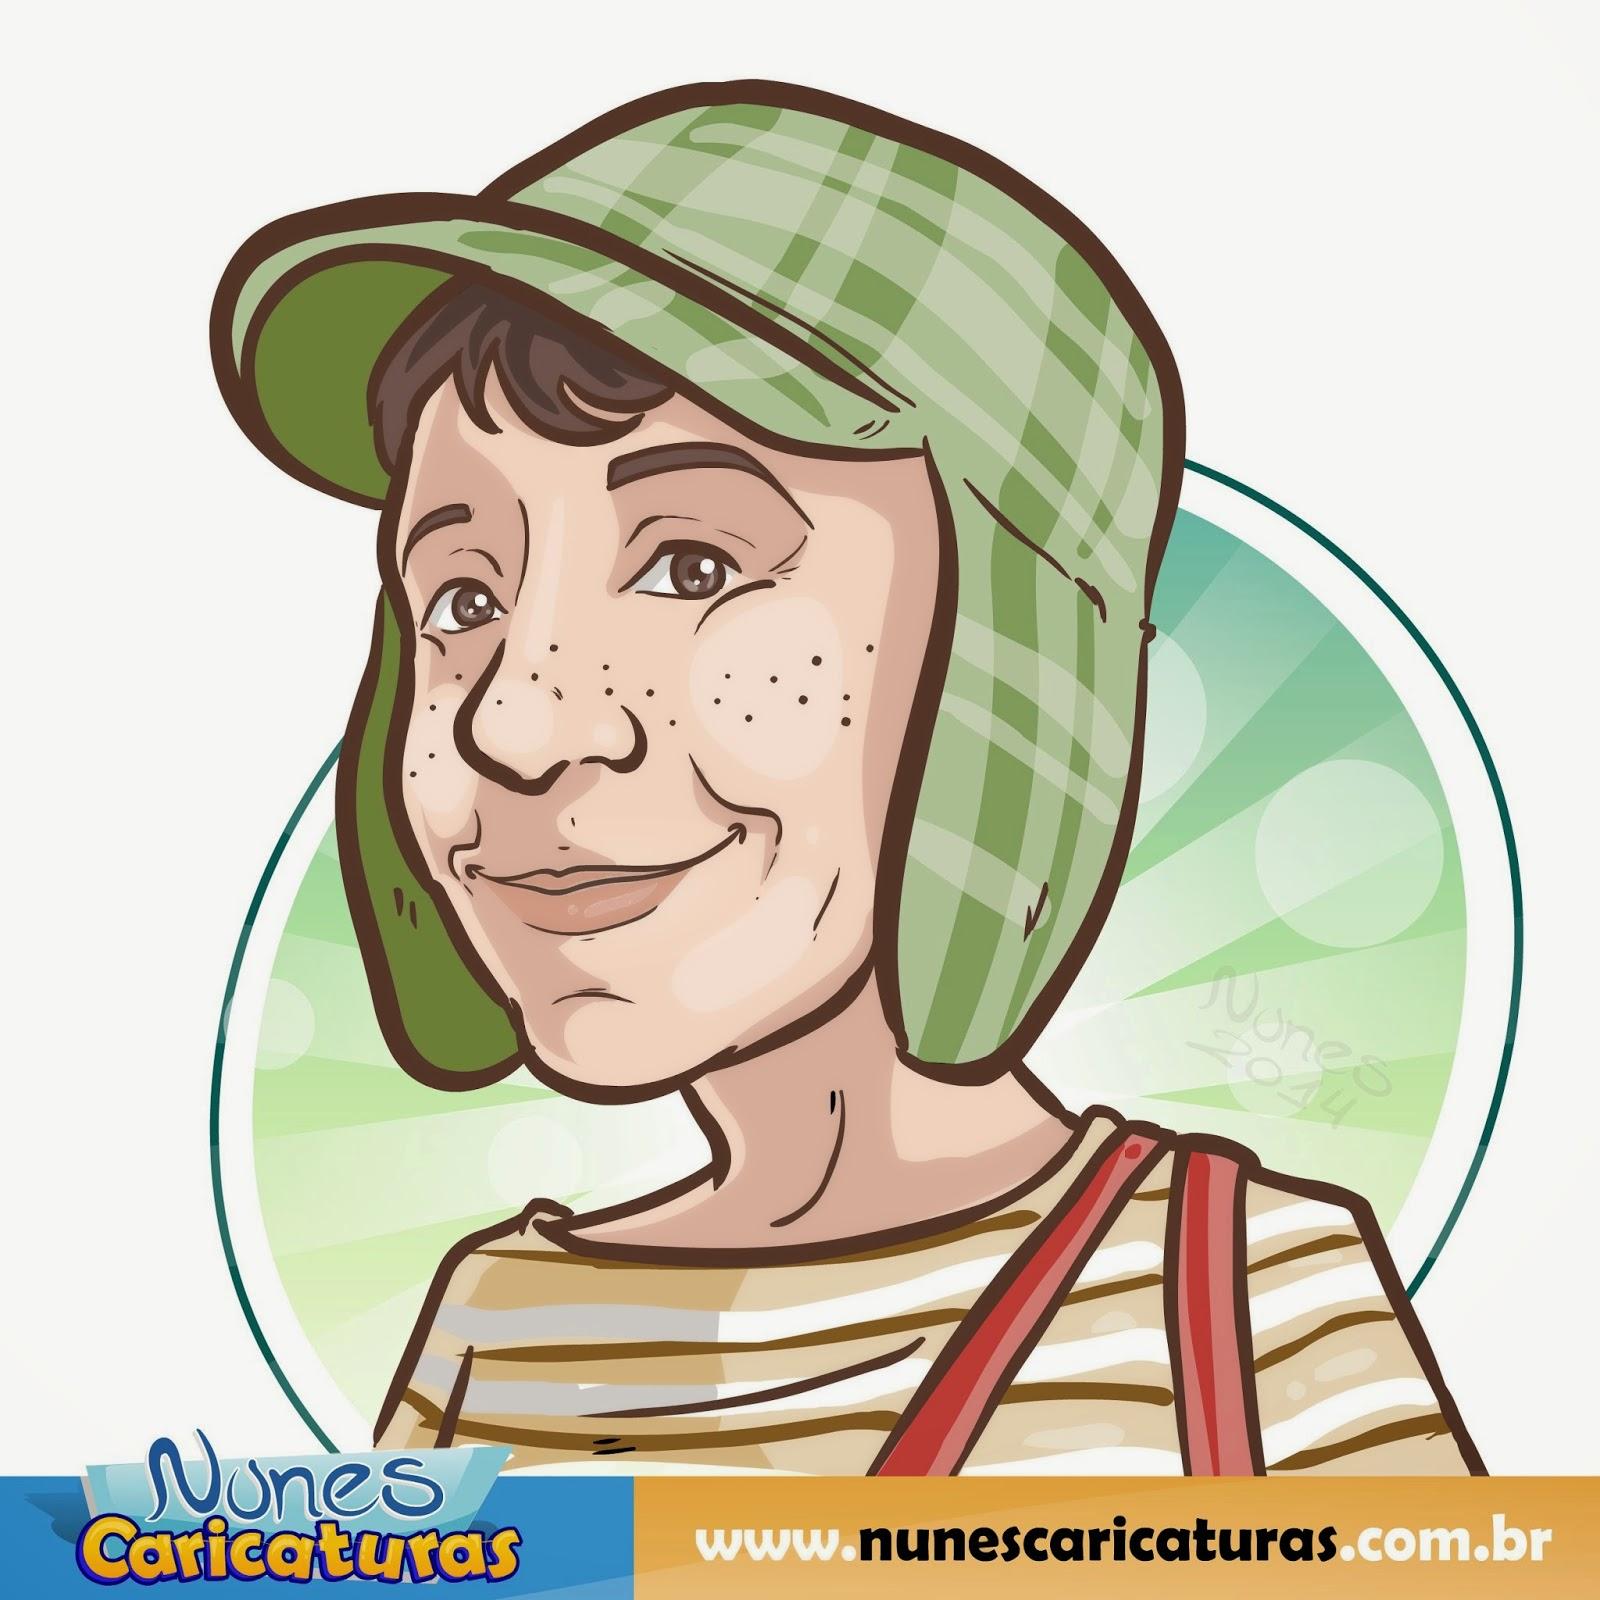 nunes caricaturas caricatura homenagem á roberto bolaños